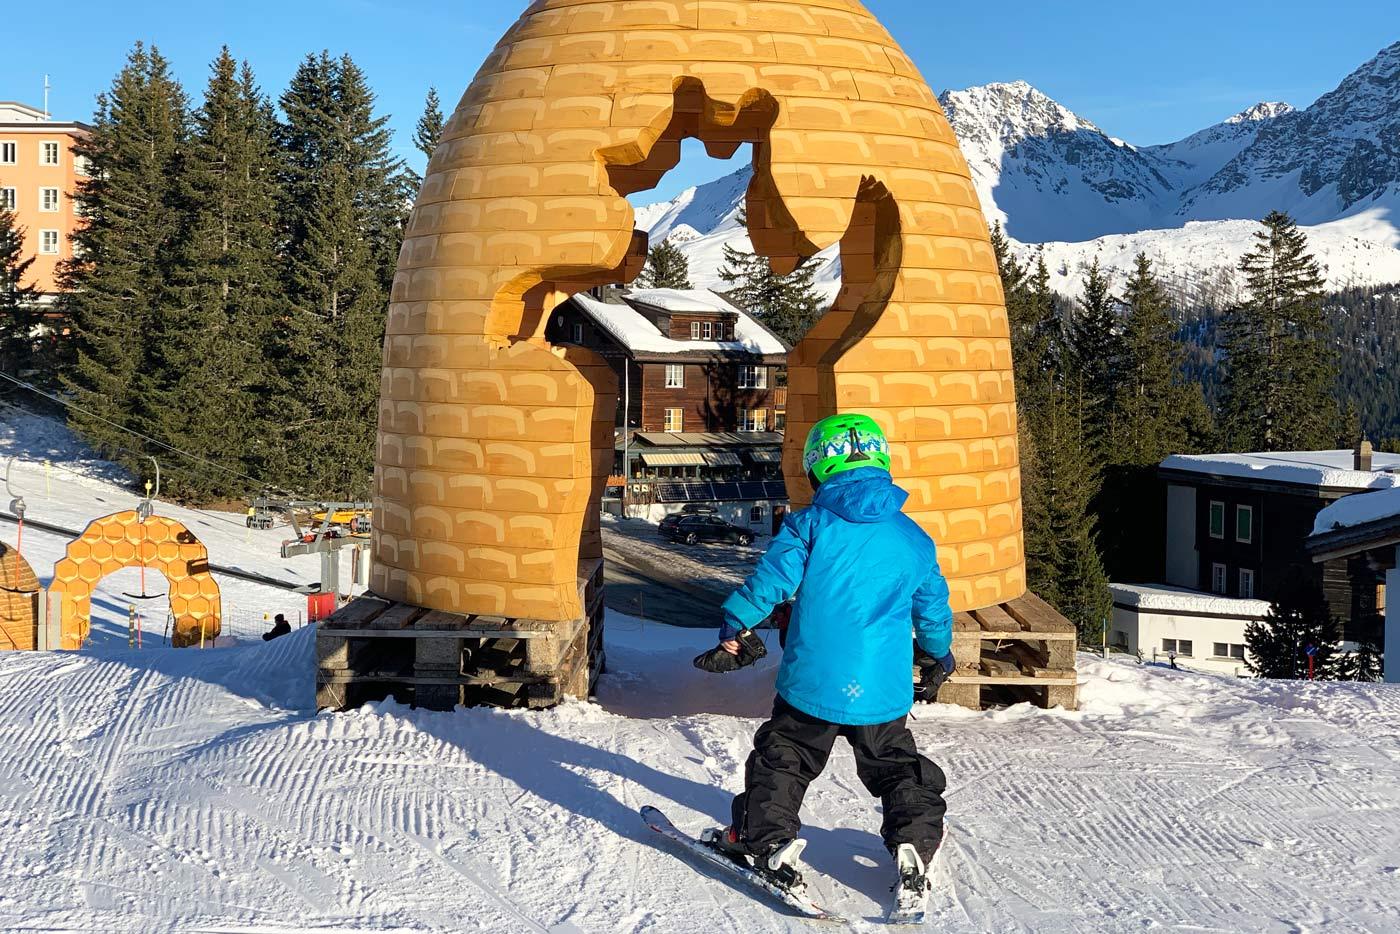 domaine skiable familial